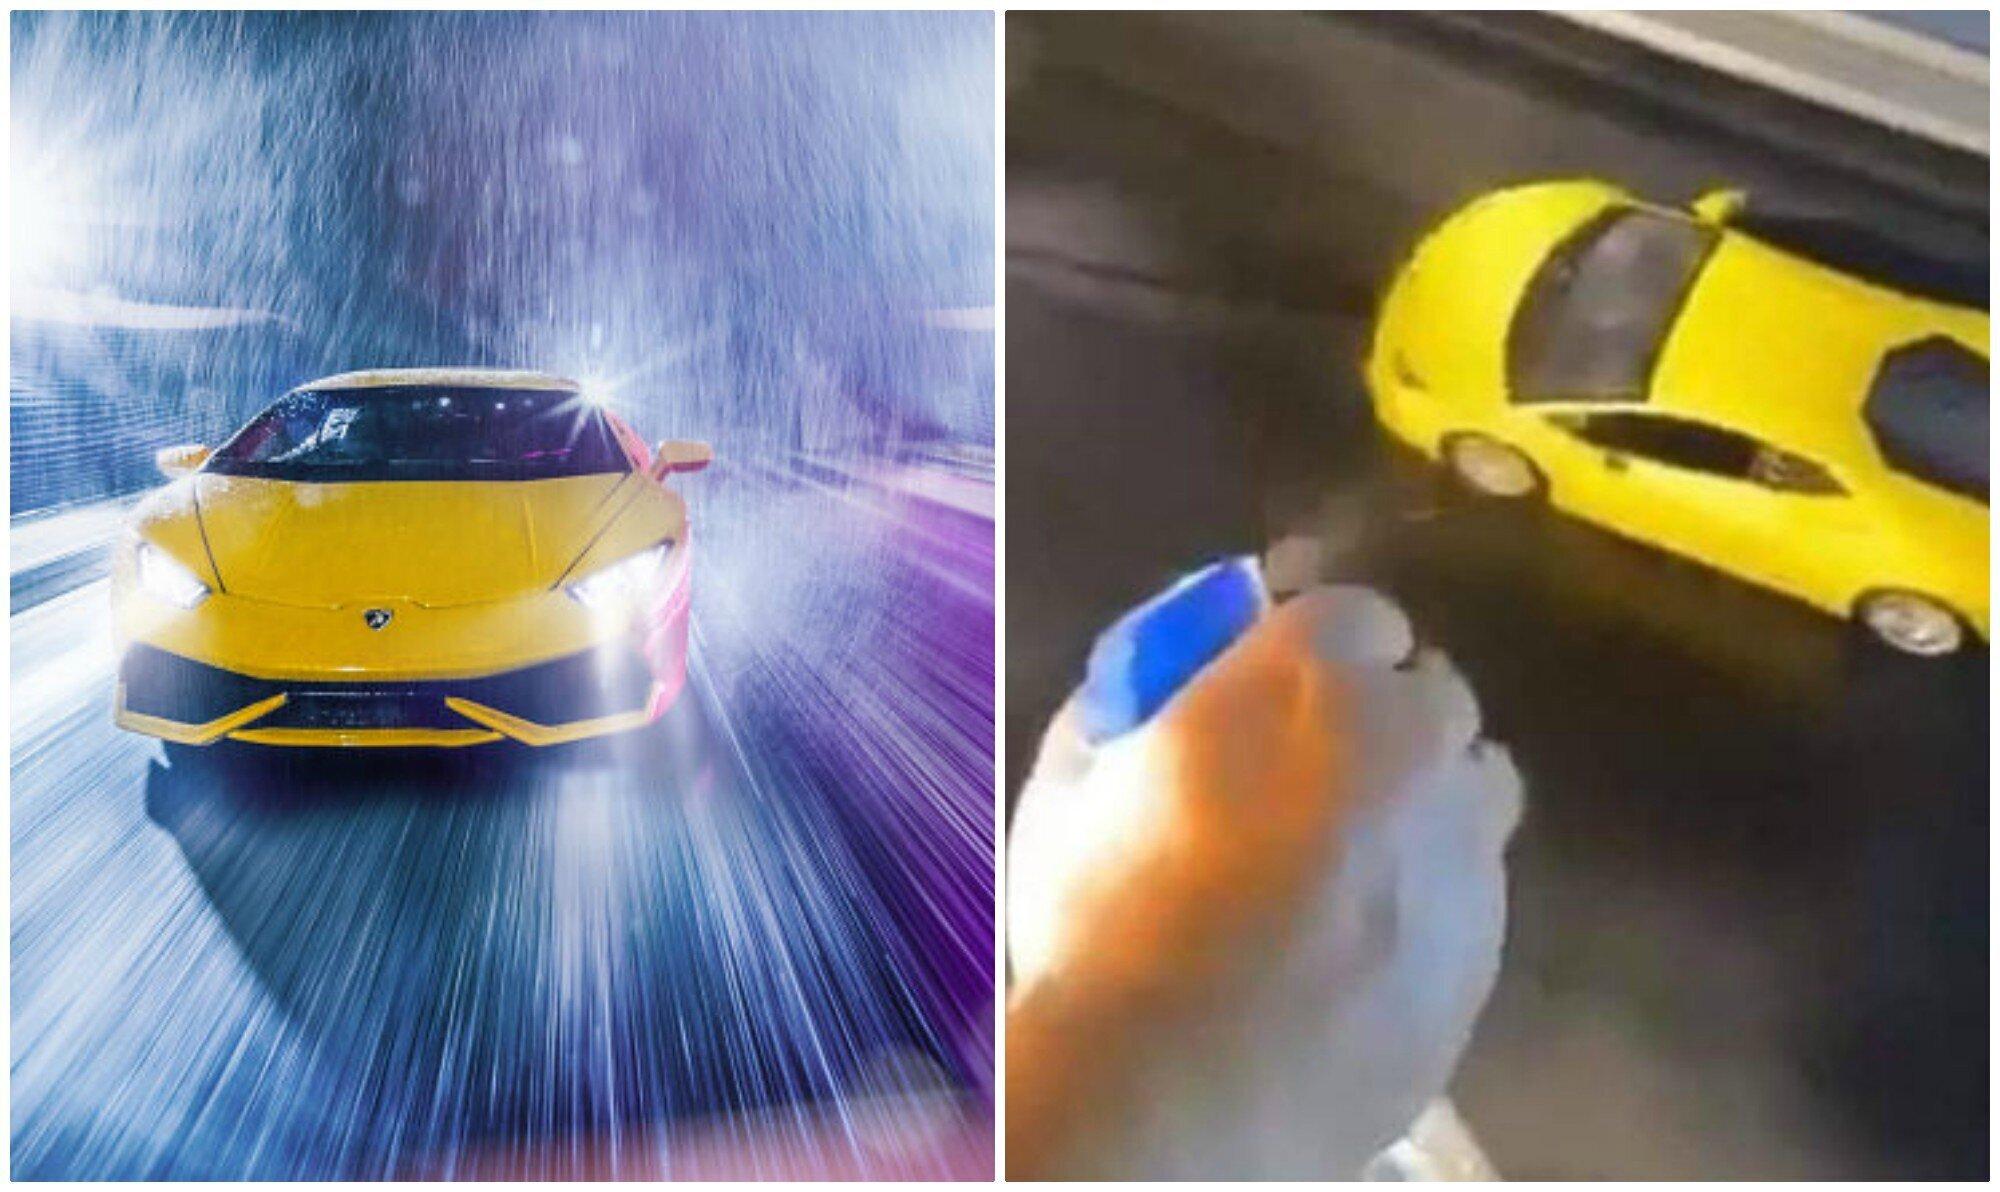 Не отличить от настоящей: фотограф устроил съемки Lamborghini у себя дома (12фото+2видео)